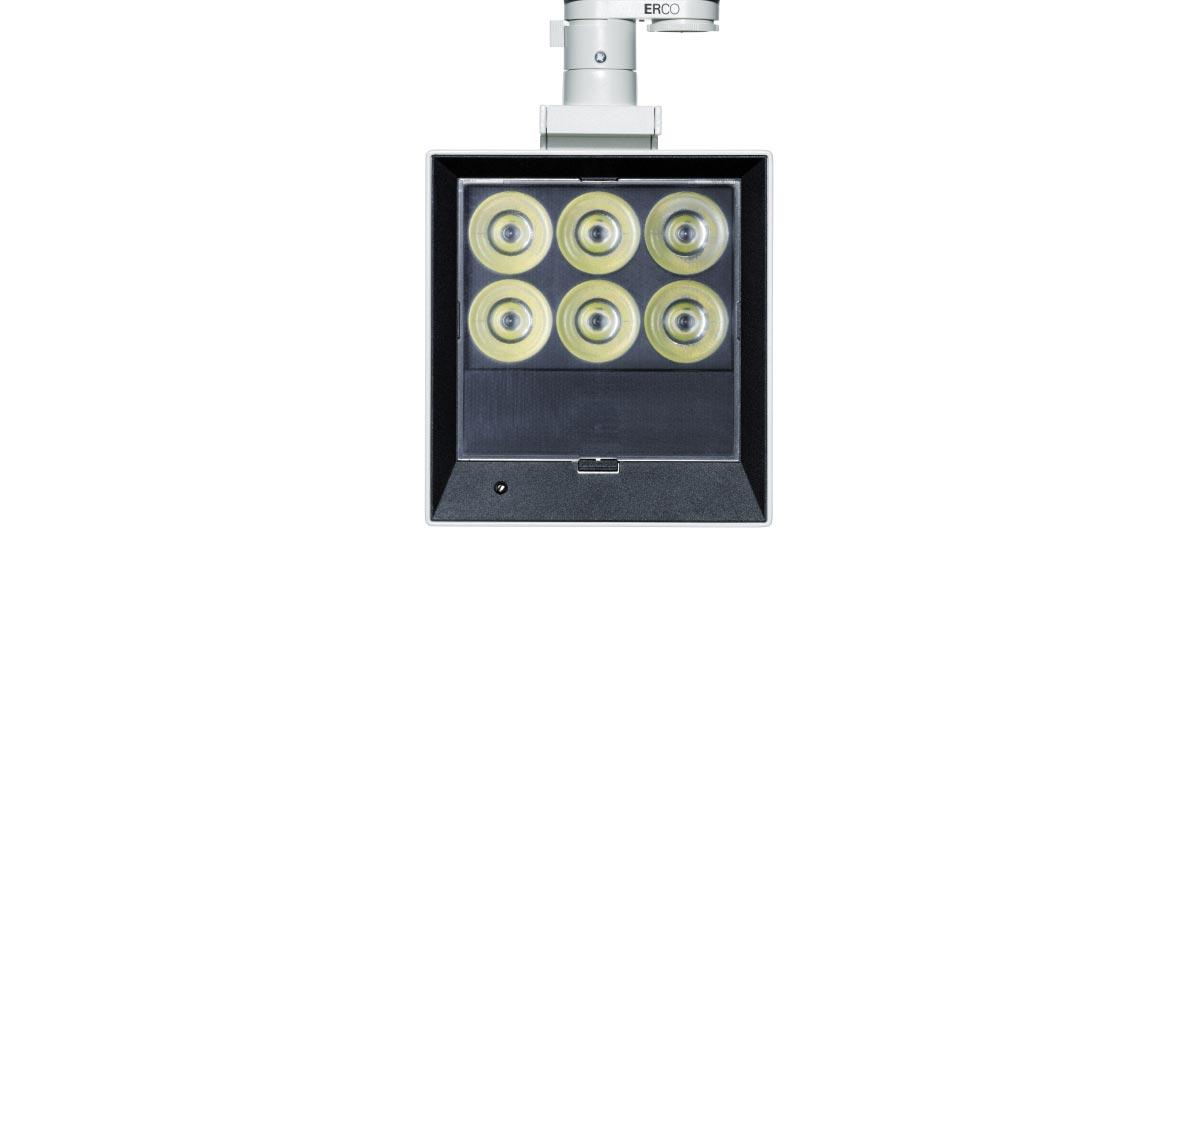 Erco light board design eur 14